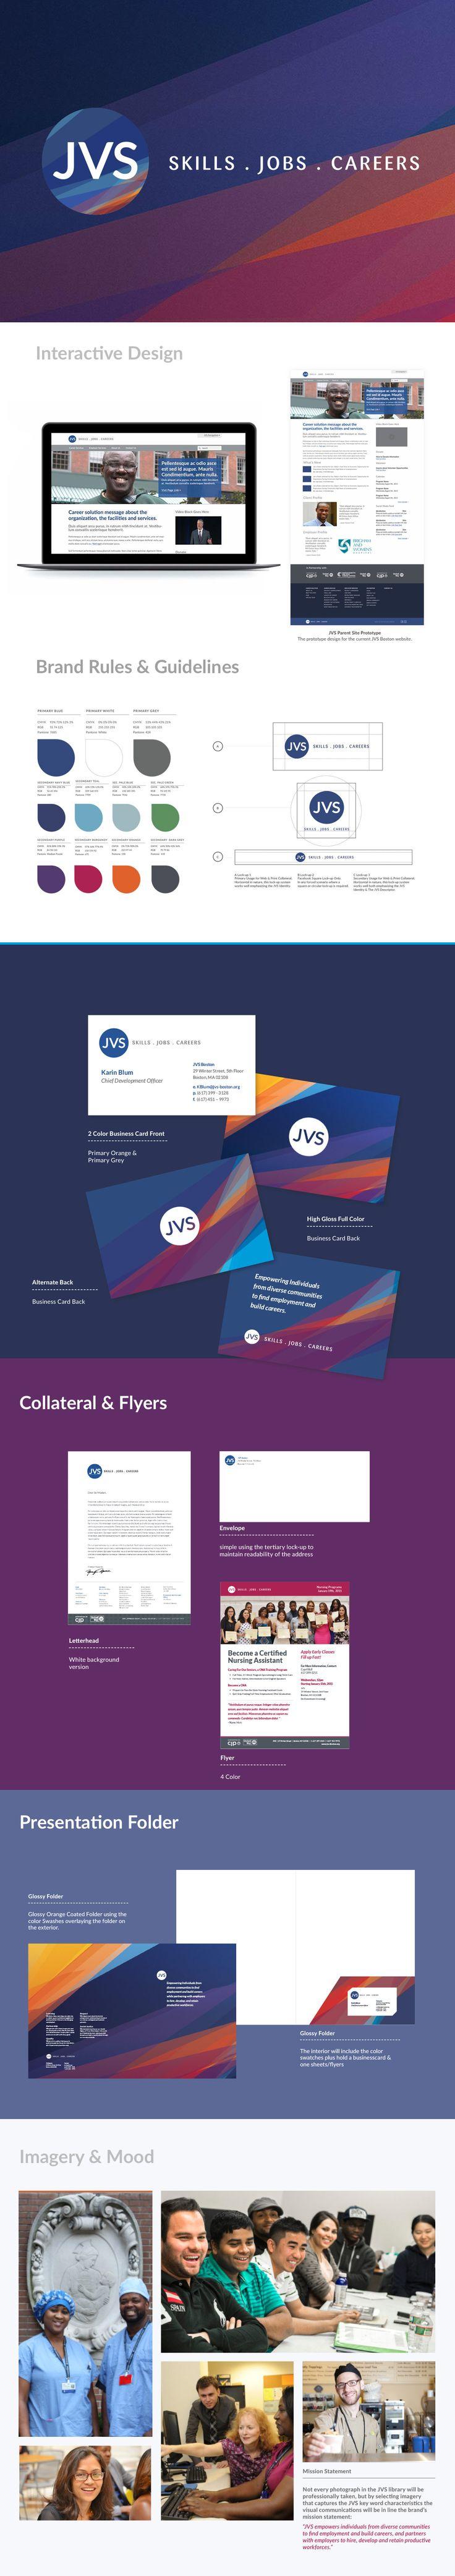 JVS - Brand Identity, Branding, Brand manual, logo, brandmark, website design, interactive design, brand application design, brand strategy guide. Creative By ElephantMark.